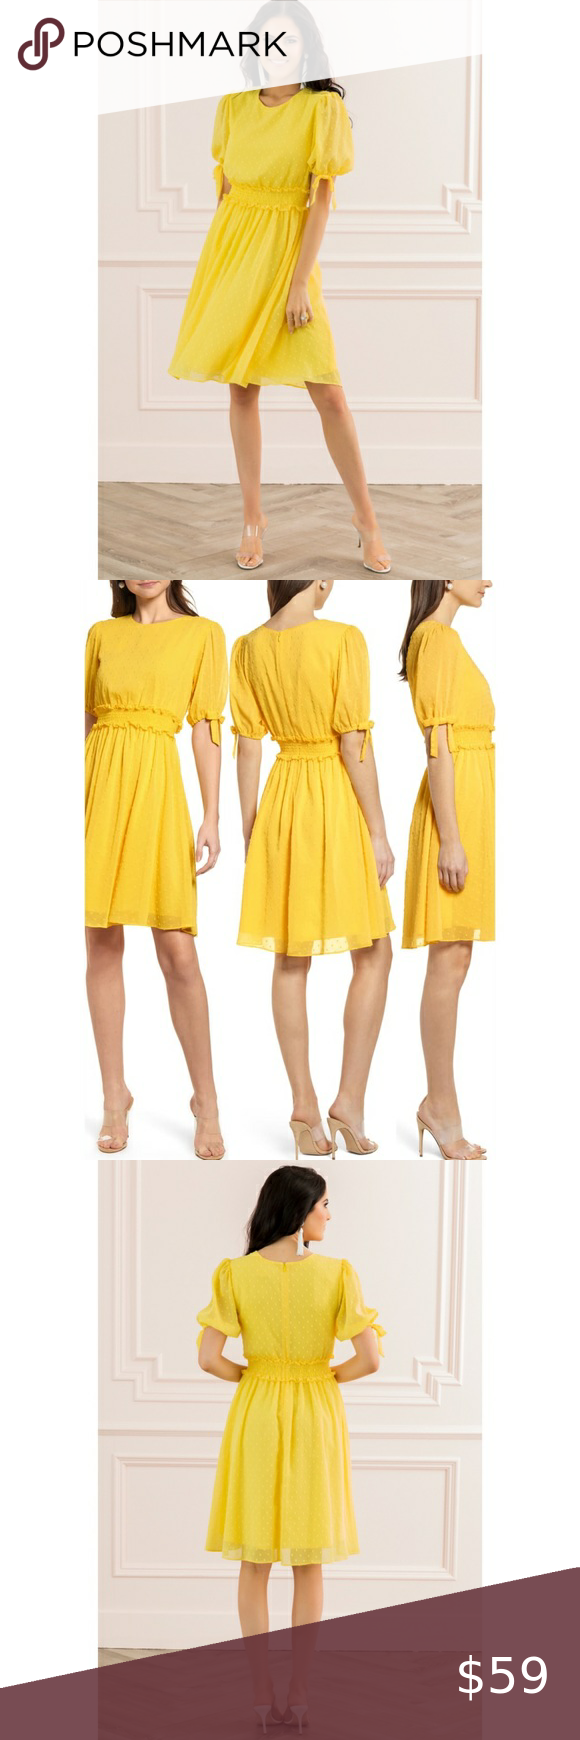 Nwt Rachel Parcell Smocked Waist Dress Yellow New Waist Dress Yellow Dress Cropped Skinny Jeans [ 1740 x 580 Pixel ]